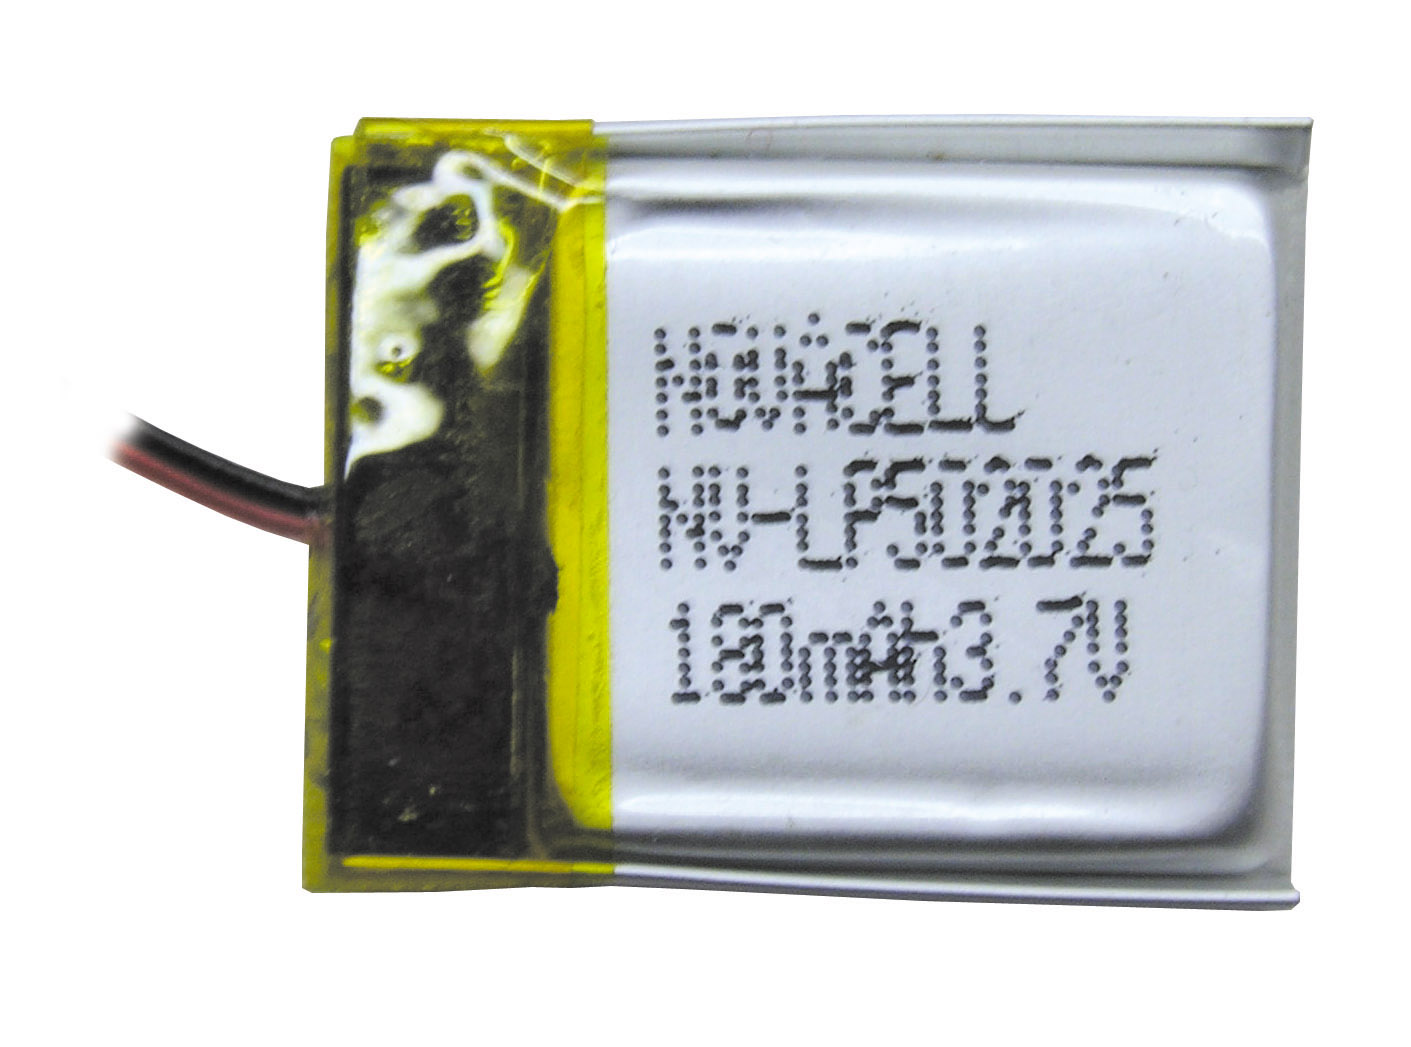 Lithium-Polymer Akku, 180 mAh, 5 x 20 x 25 mm